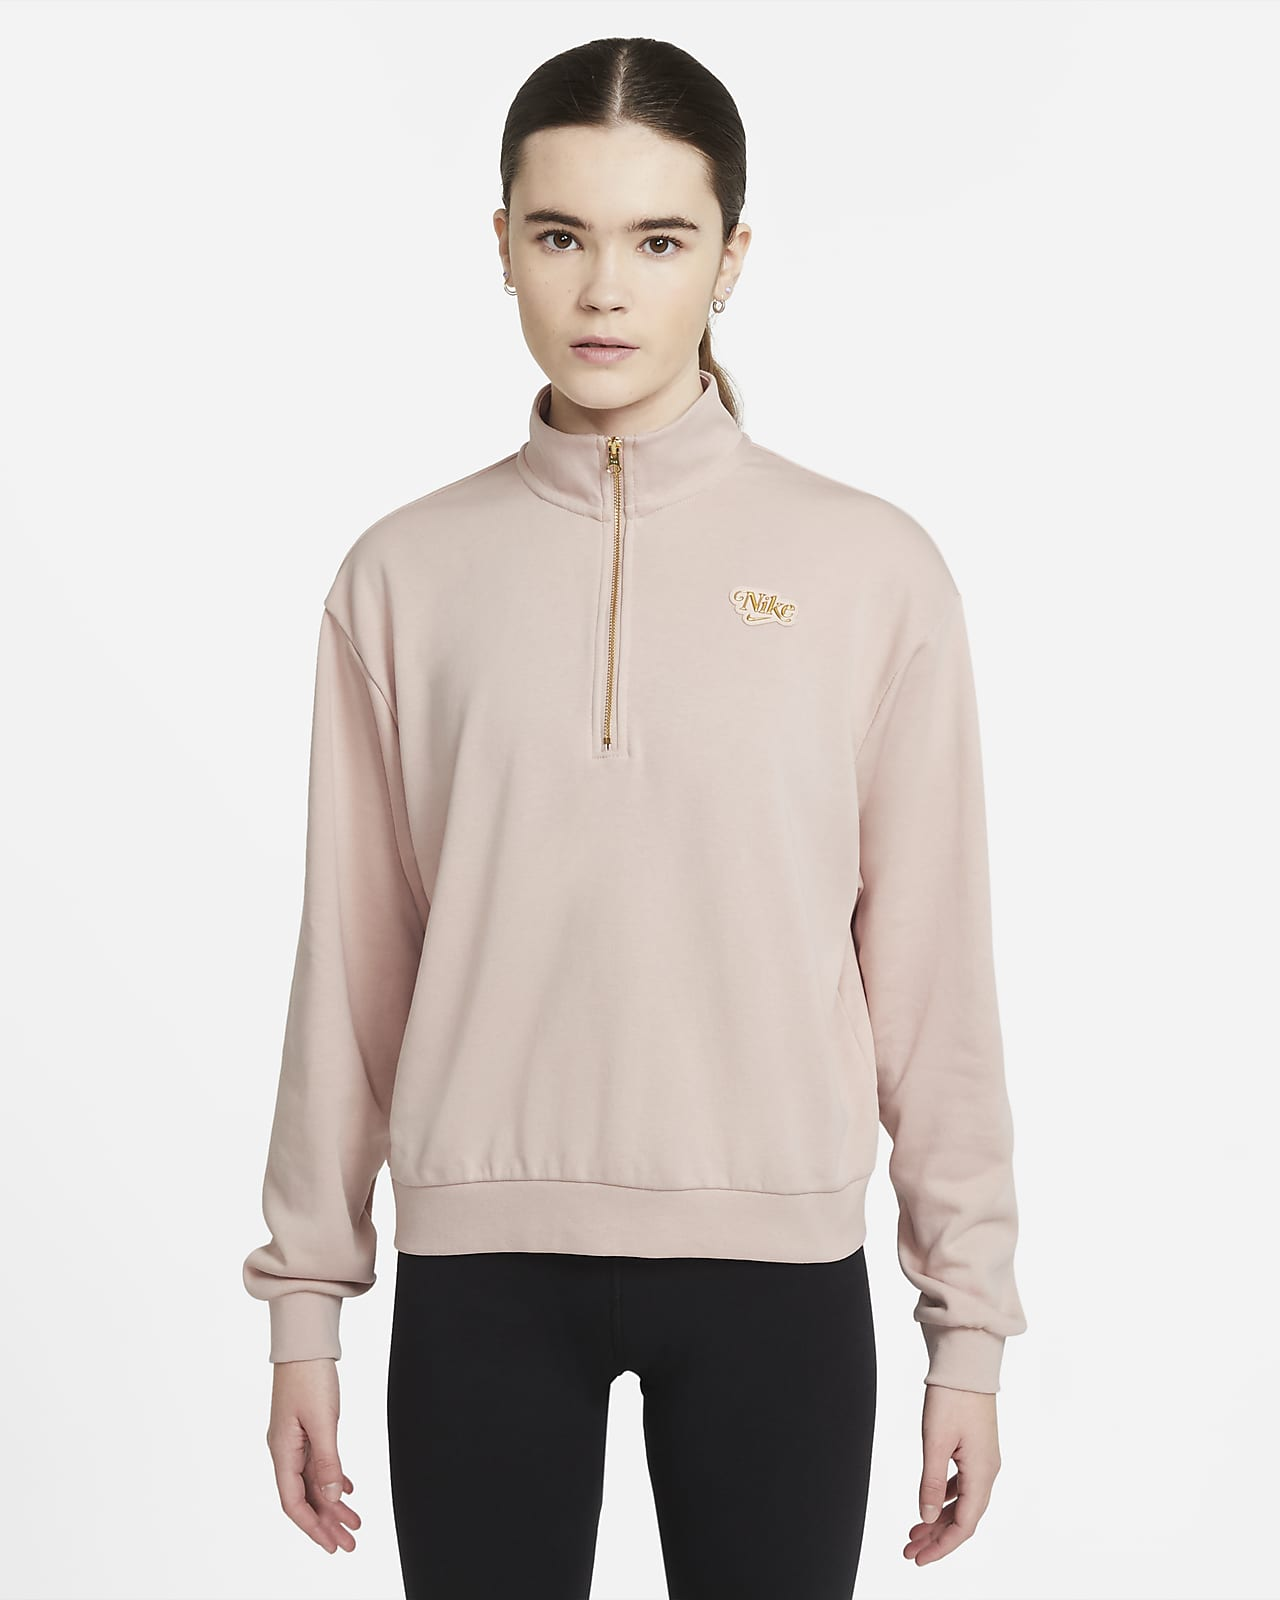 Camisola com fecho a 1/4 Nike Sportswear Femme para mulher